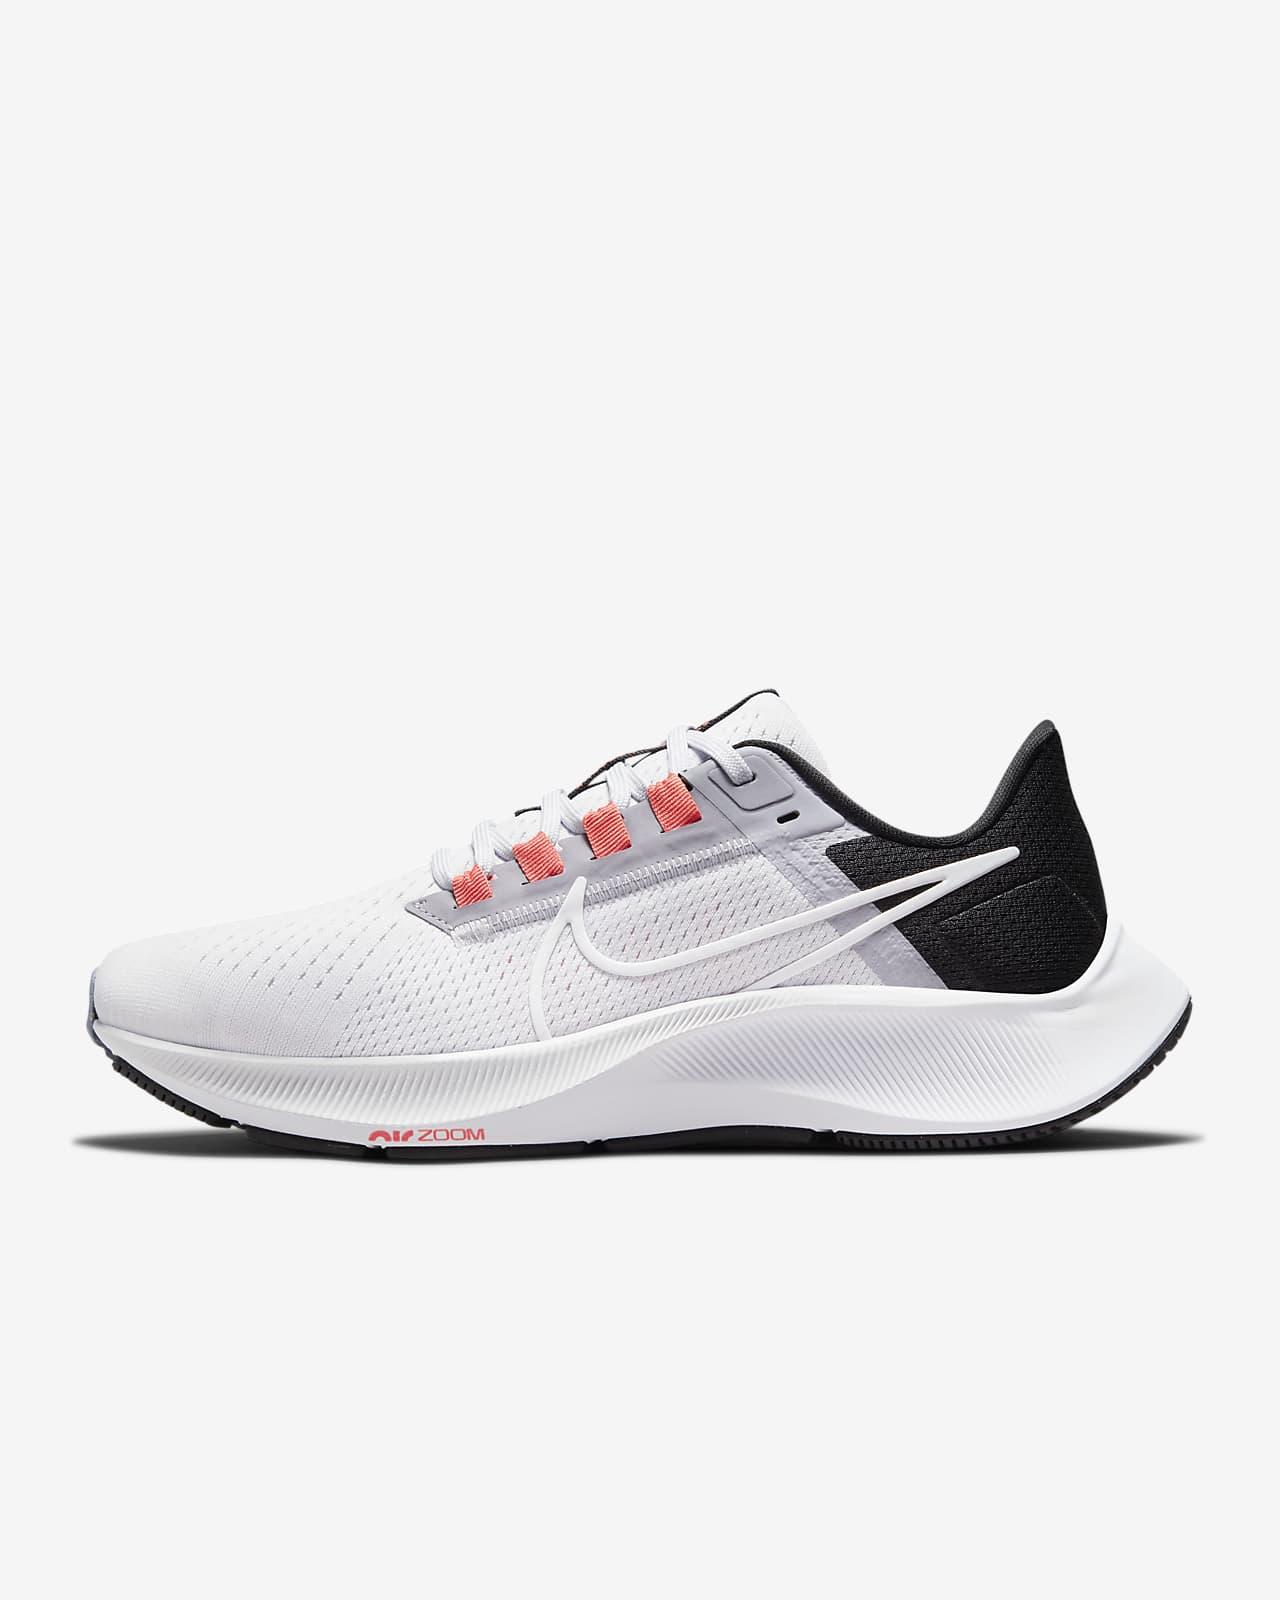 Nike Air Zoom Pegasus 38 Zapatillas de running para carretera - Mujer